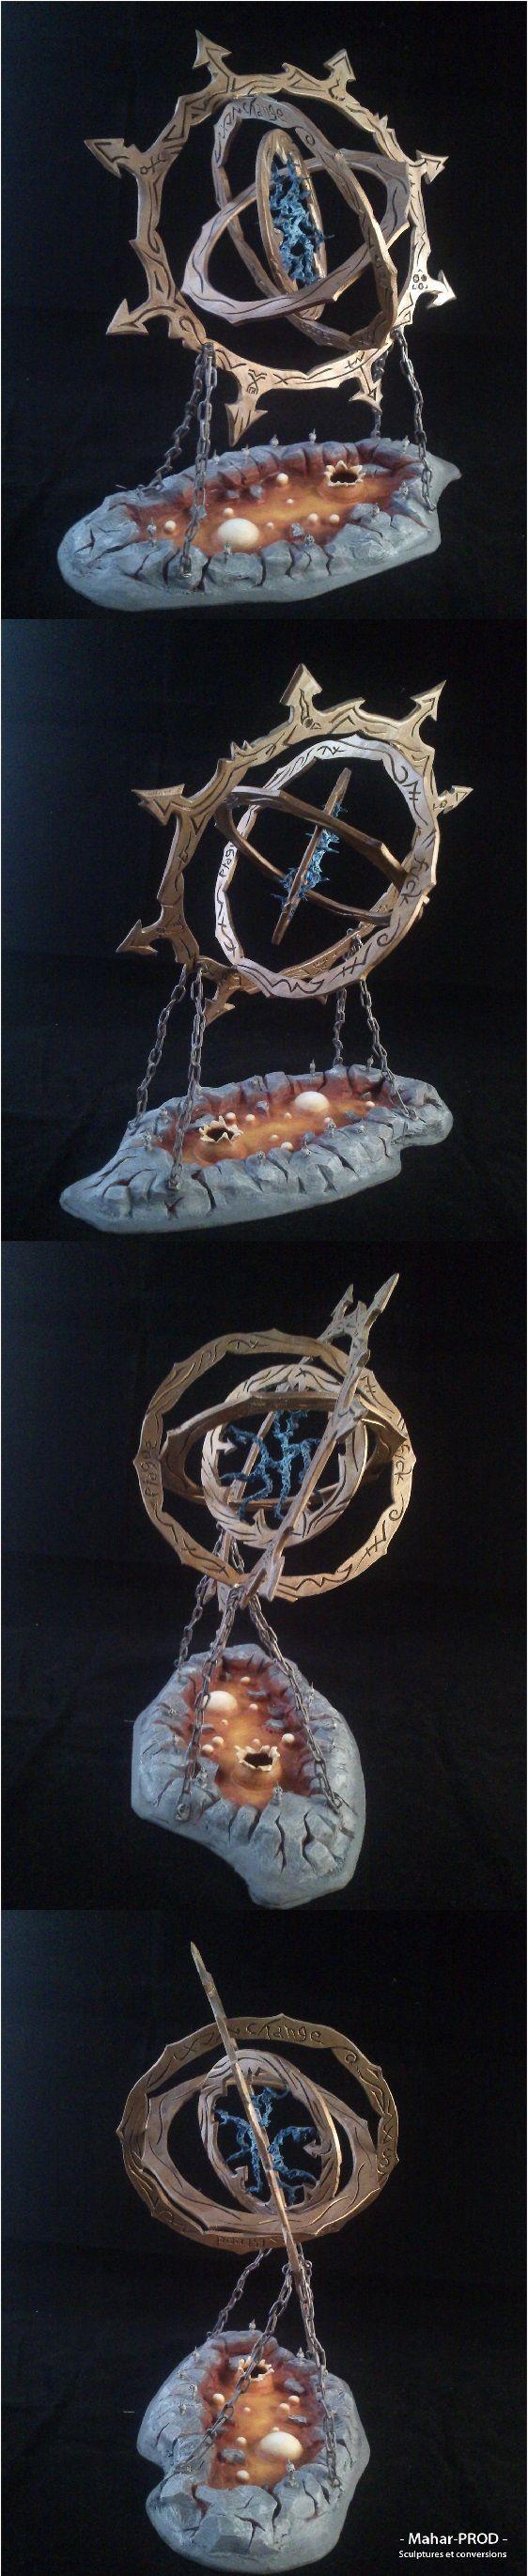 Gyroscopic Chaos Portal by Mahar